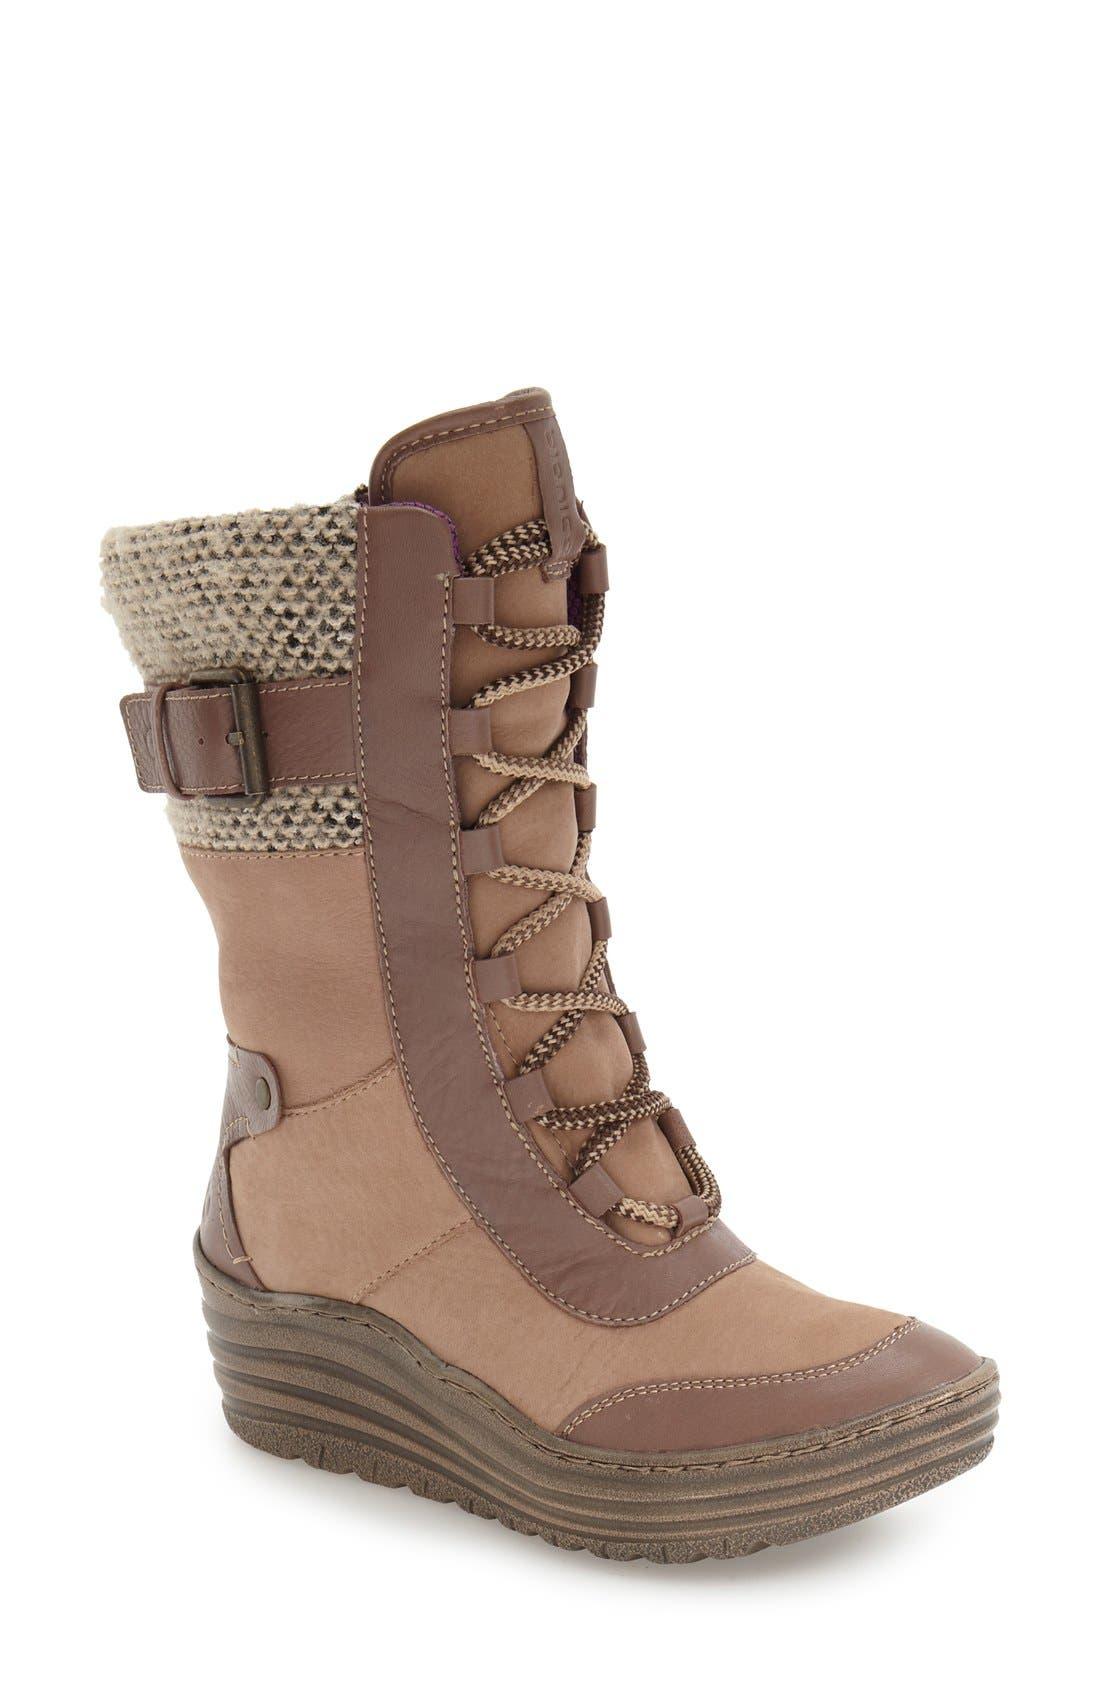 bionica Garland Waterproof Wedge Boot (Women)